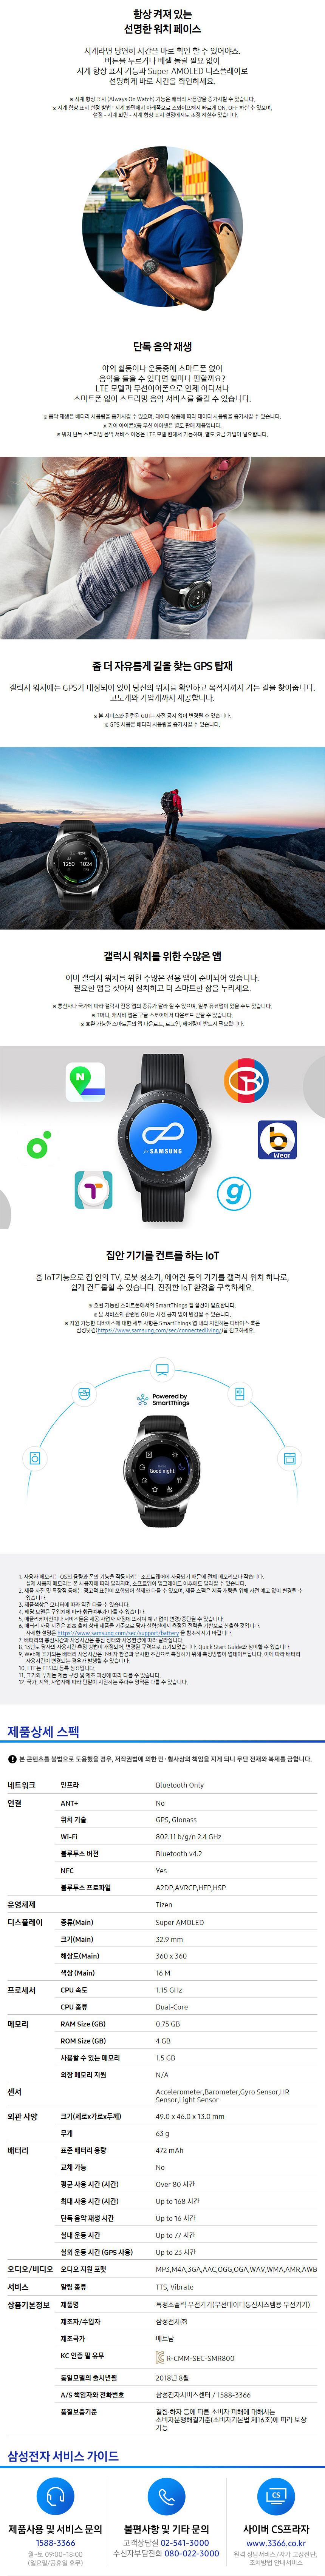 항상 켜져 있는 선명한 워치 페이스 시계라면 당연히 시간을 바로 확인 할 수 있어야죠 버튼을 누르거나 베젤 돌릴 필요 없이 시계 항상 표시 기능과 디스플레이로 선명하게 바로 시간을 확인하세요. 시계 향상 표시 (AIways On Watch) 기능은 배터리 사용량을 증가시킬 수 있습니다. 시계 향상 표시 설정 방법 : 시계 화면에서 아래쪽으로 스와이프해서 빠르게 ON, OFF 하실 수 있으며, 설정-시계화면-시계 항상 표시 설정에도 조정 하실수 있습니다. 단독 음악 재생 야외 활동이나 운동중에 스마트폰 없이 음악을 들을 수 있다면 얼마나 편할까요 LTE 모델과 무선이어폰으로 언제 어디서나 스마트폰 없이 스트리밍 음악 서비스를 즐길 수 있습니다. 음악 재생은 배터리 사용량을 증가시킬 수 있으며, 데이터 상품에 따라 데이터 사용량을 증가시킬 수 있습니다. 기어 아이콘X등 무선 이어셋은 별도 판매 제품입니다. 워치 단독 스트리밍 음악 서비스 이용은 LTE 모델 한해서 가능하며, 별도 요금 가입이 필요합니다. 좀 더 자유롭게 길을 찾는 GPS탑재 갤럭시 워치에는 GPS가 내장되어 있어 당신의 위치를 확인하고 목적지까지 가는 길을 찾아줍니다 고도계와 기압계까지 제공합니다. 본 서비스와 관련된 GUI는 사전 공지 없이 변경될 수 있습니다. GPS 사용은 배터리 사용량을 증가시킬 수 있습니다. 갤럭시 워치를 위한 수많은 앱 이미 갤럭시 워치를 위한 수많은 전용 앱이 준비되어 있습니다 필요한 앱을 찾아서 설치하고 더 스마트한 삶을 누리세요. 통신사나 국가에 따라 갤럭시 전용 앱의 종류가 달라 질 수 있으며, 일부 유로앱이 있을 수도 있습니다. T머니,캐시비 앱은 구글 스토어에서 다운로드 받을 수 있습니다. 호환 가능한 스마트폰의 앱 다운로드, 로그인, 페어링이 반드시 필요합니다. 집안 기기를 컨트롤 하는 IoT  홈 IoT기능으로 집 안의 TV 로봇 청소기 에어컨 등의 기기를 갤럭시 워치 하나로 쉽게 컨트롤할 수 있습니다 진정한 IoT 환경을 구축하세요. 호환 가능한 스마트폰에서의 SmartThings 앱 설정이 필요합니다. 본 서비스와 관련한 GUI는 사전 공지 없이 변경될 수 있습니다. 지원 가능한 디바이스에 대한 세부 사항은 SmartThings앱 내의 지원하는 디바이스 혹은 삼성닷컴(http://www.samsung.com/sec/connectedliving/)를 참고 하세요. 1. 사용자 메모리는 OS의 용량과 폰의 기능을 작동시키는 소프트웨어에 사용되기 때문에 전체 메모리보다 작습니다. | 실제 사용자 메모리는 폰 사용자에 따라 달라지며, 소프트웨어 업그레이드 이후에도 달라질 수 있습니다. 2. 제품 사진 및 특장점 등에는 광고적 표현이 포함되어 실제와 다를 수 있으며, 제품 스펙은 제품 개량을 위해 사전 예고 없이 변경될 수 | 있습니다. 3. 제품색상은 모니터에 따라 약간 다를 수 있습니다. 4. 해당 모델은 구입처에 따라 취급여부가 다를 수 있습니다. 5. 애플리케이션이나 서비스들은 제공 사업자 사정에 의하여 예고 없이 변경/중단될 수 있습니다. 6. 배터리 사용 시간은 최초 출하 상태 제품을 기준으로 당사 실험실에서 측정된 전력을 기반으로 산출한 것입니다. | 자세한 설명은 https://www.samsung.com/sec/support/battery 을 참조하시기 바랍니다. 7. 배터리의 충전시간과 사용시간은 충전 상태와 사용환경에 따라 달라집니다. 8 13년도 당사의 사용시간 측정 방법이 개정되어, 변경된 규격으로 표기되었습니다. Quick Start Guide와 상이할 수 있습니다. 9. Web에 표기되는 배터리 사용시간은 소비자 환경과 유사한 조건으로 측정하기 위해 측정방법이 업데이트됩니다. 이에 따라 배터리 사용시간이 변경되는 경우가 발생할 수 있습니다. 10. LTE는 ETSI의 등록 상표입니다. 11. 크기와 무게는 제품 구성 및 제조 과정에 따라 다를 수 있습니다. 12. 국가, 지역, 사업자에 따라 단말이 지원하는 주파수 영역은 다를 수 있습니다.| 제품상세 스펙 Q 본 콘텐츠를 불법으로 도용했을